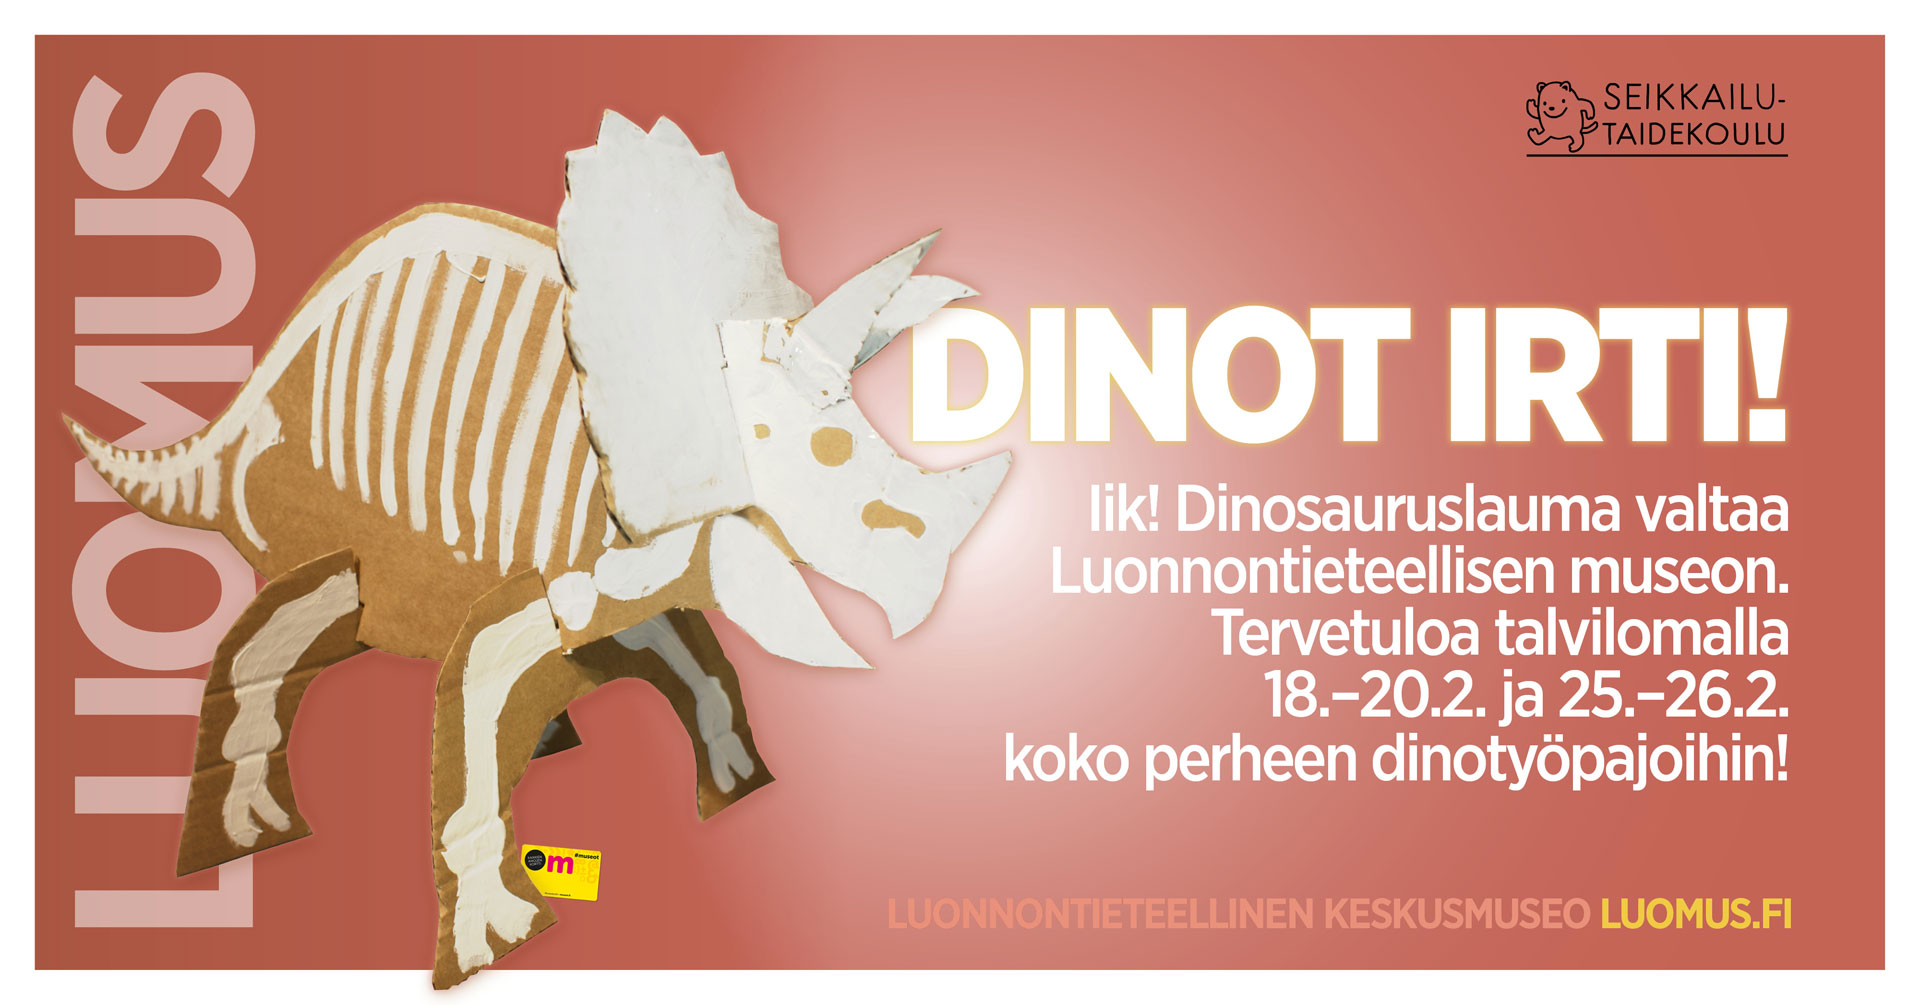 Link to event Build a Dinosaur Workshop